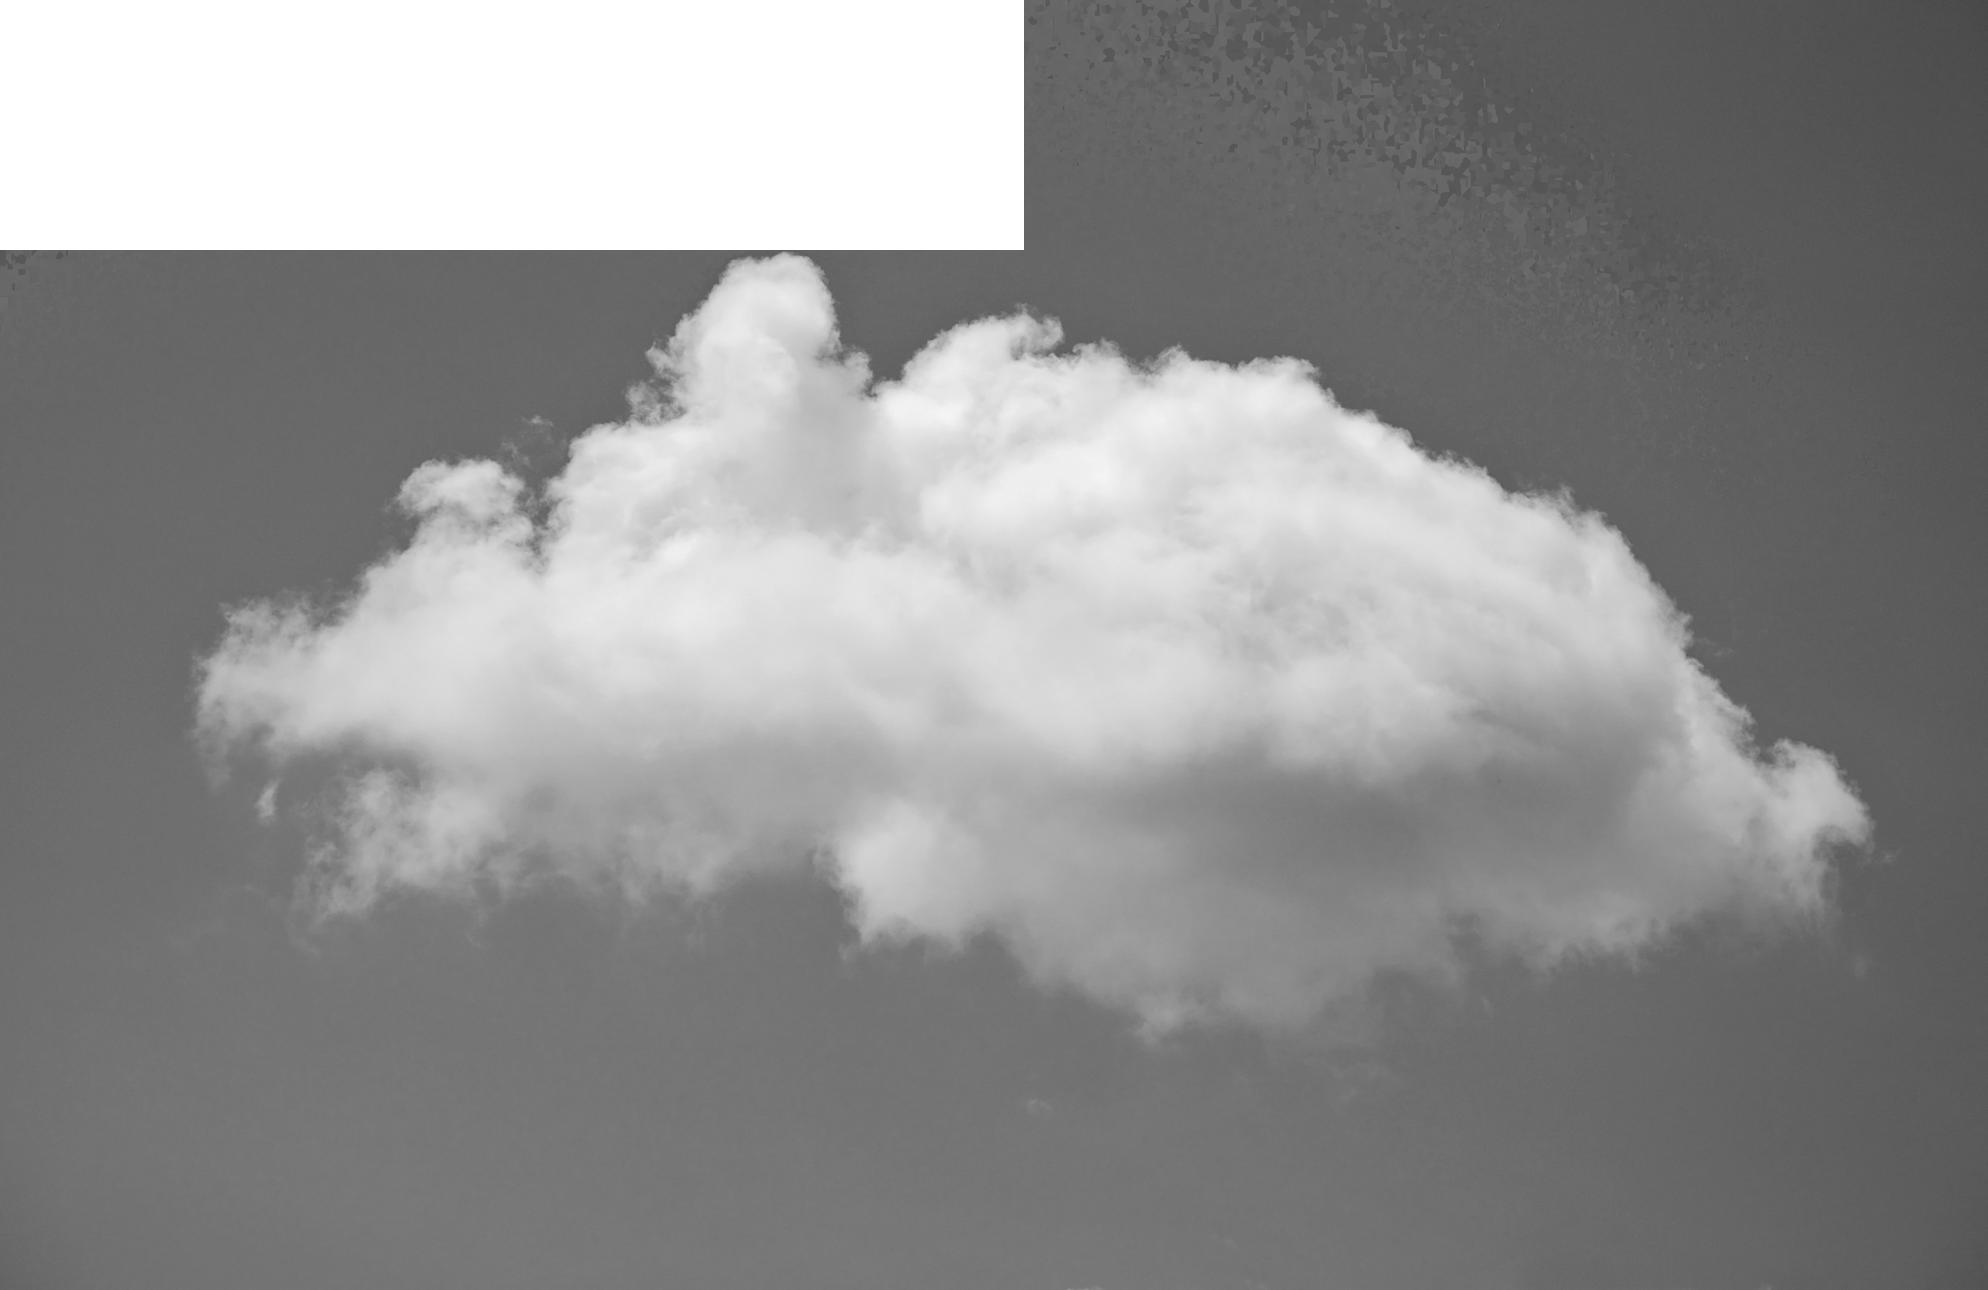 Png Cloud Oblaka Goroshek Fon Fotokollazh